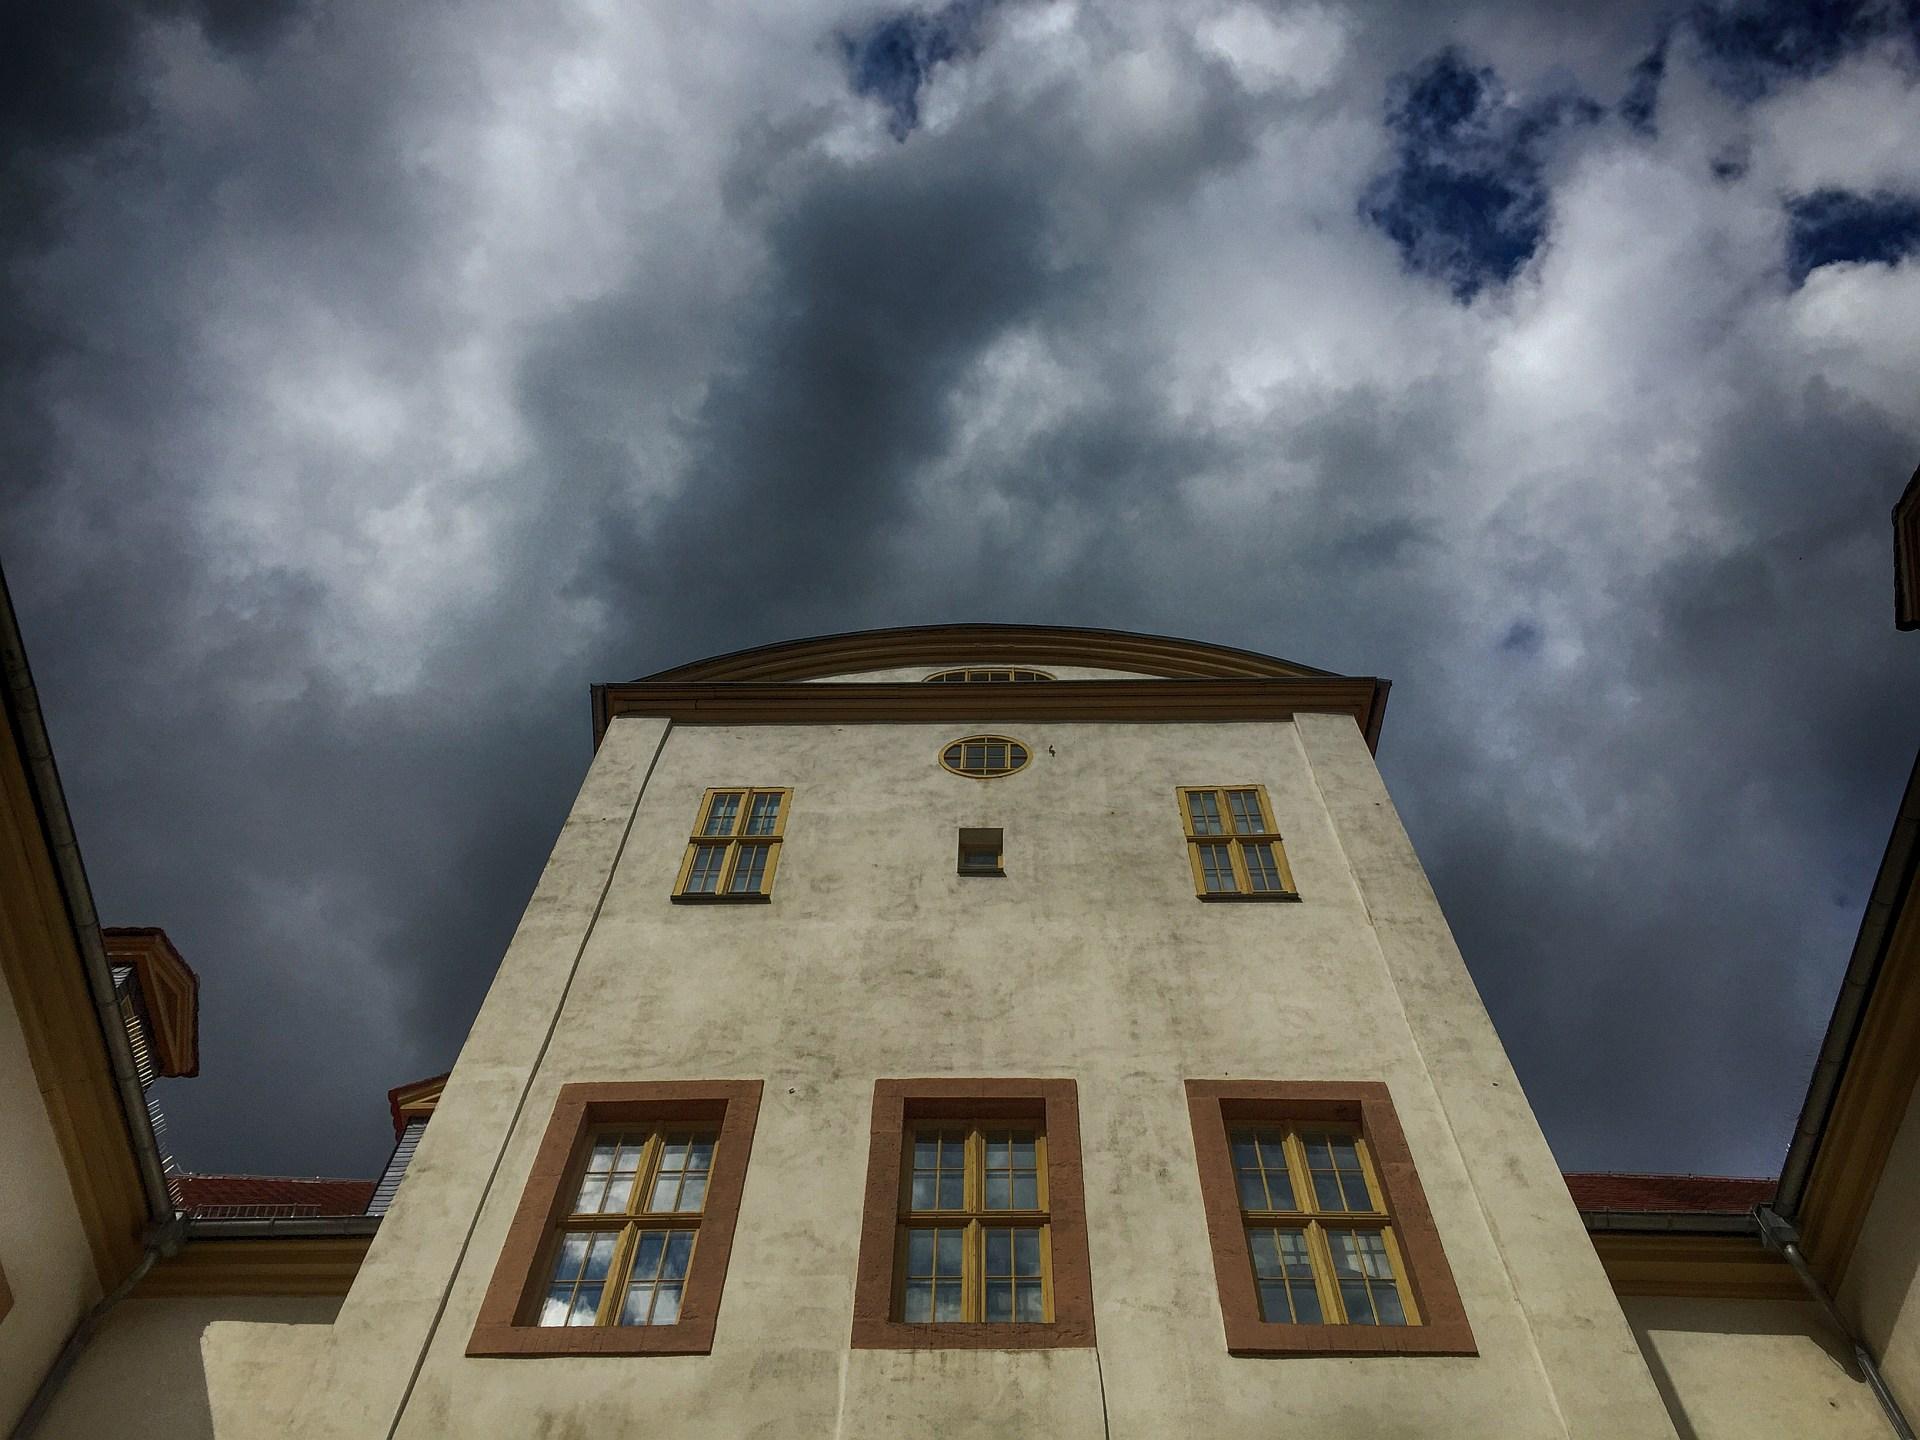 Eisenberg - Kreisverwaltung Saale-Holzland-Kreis